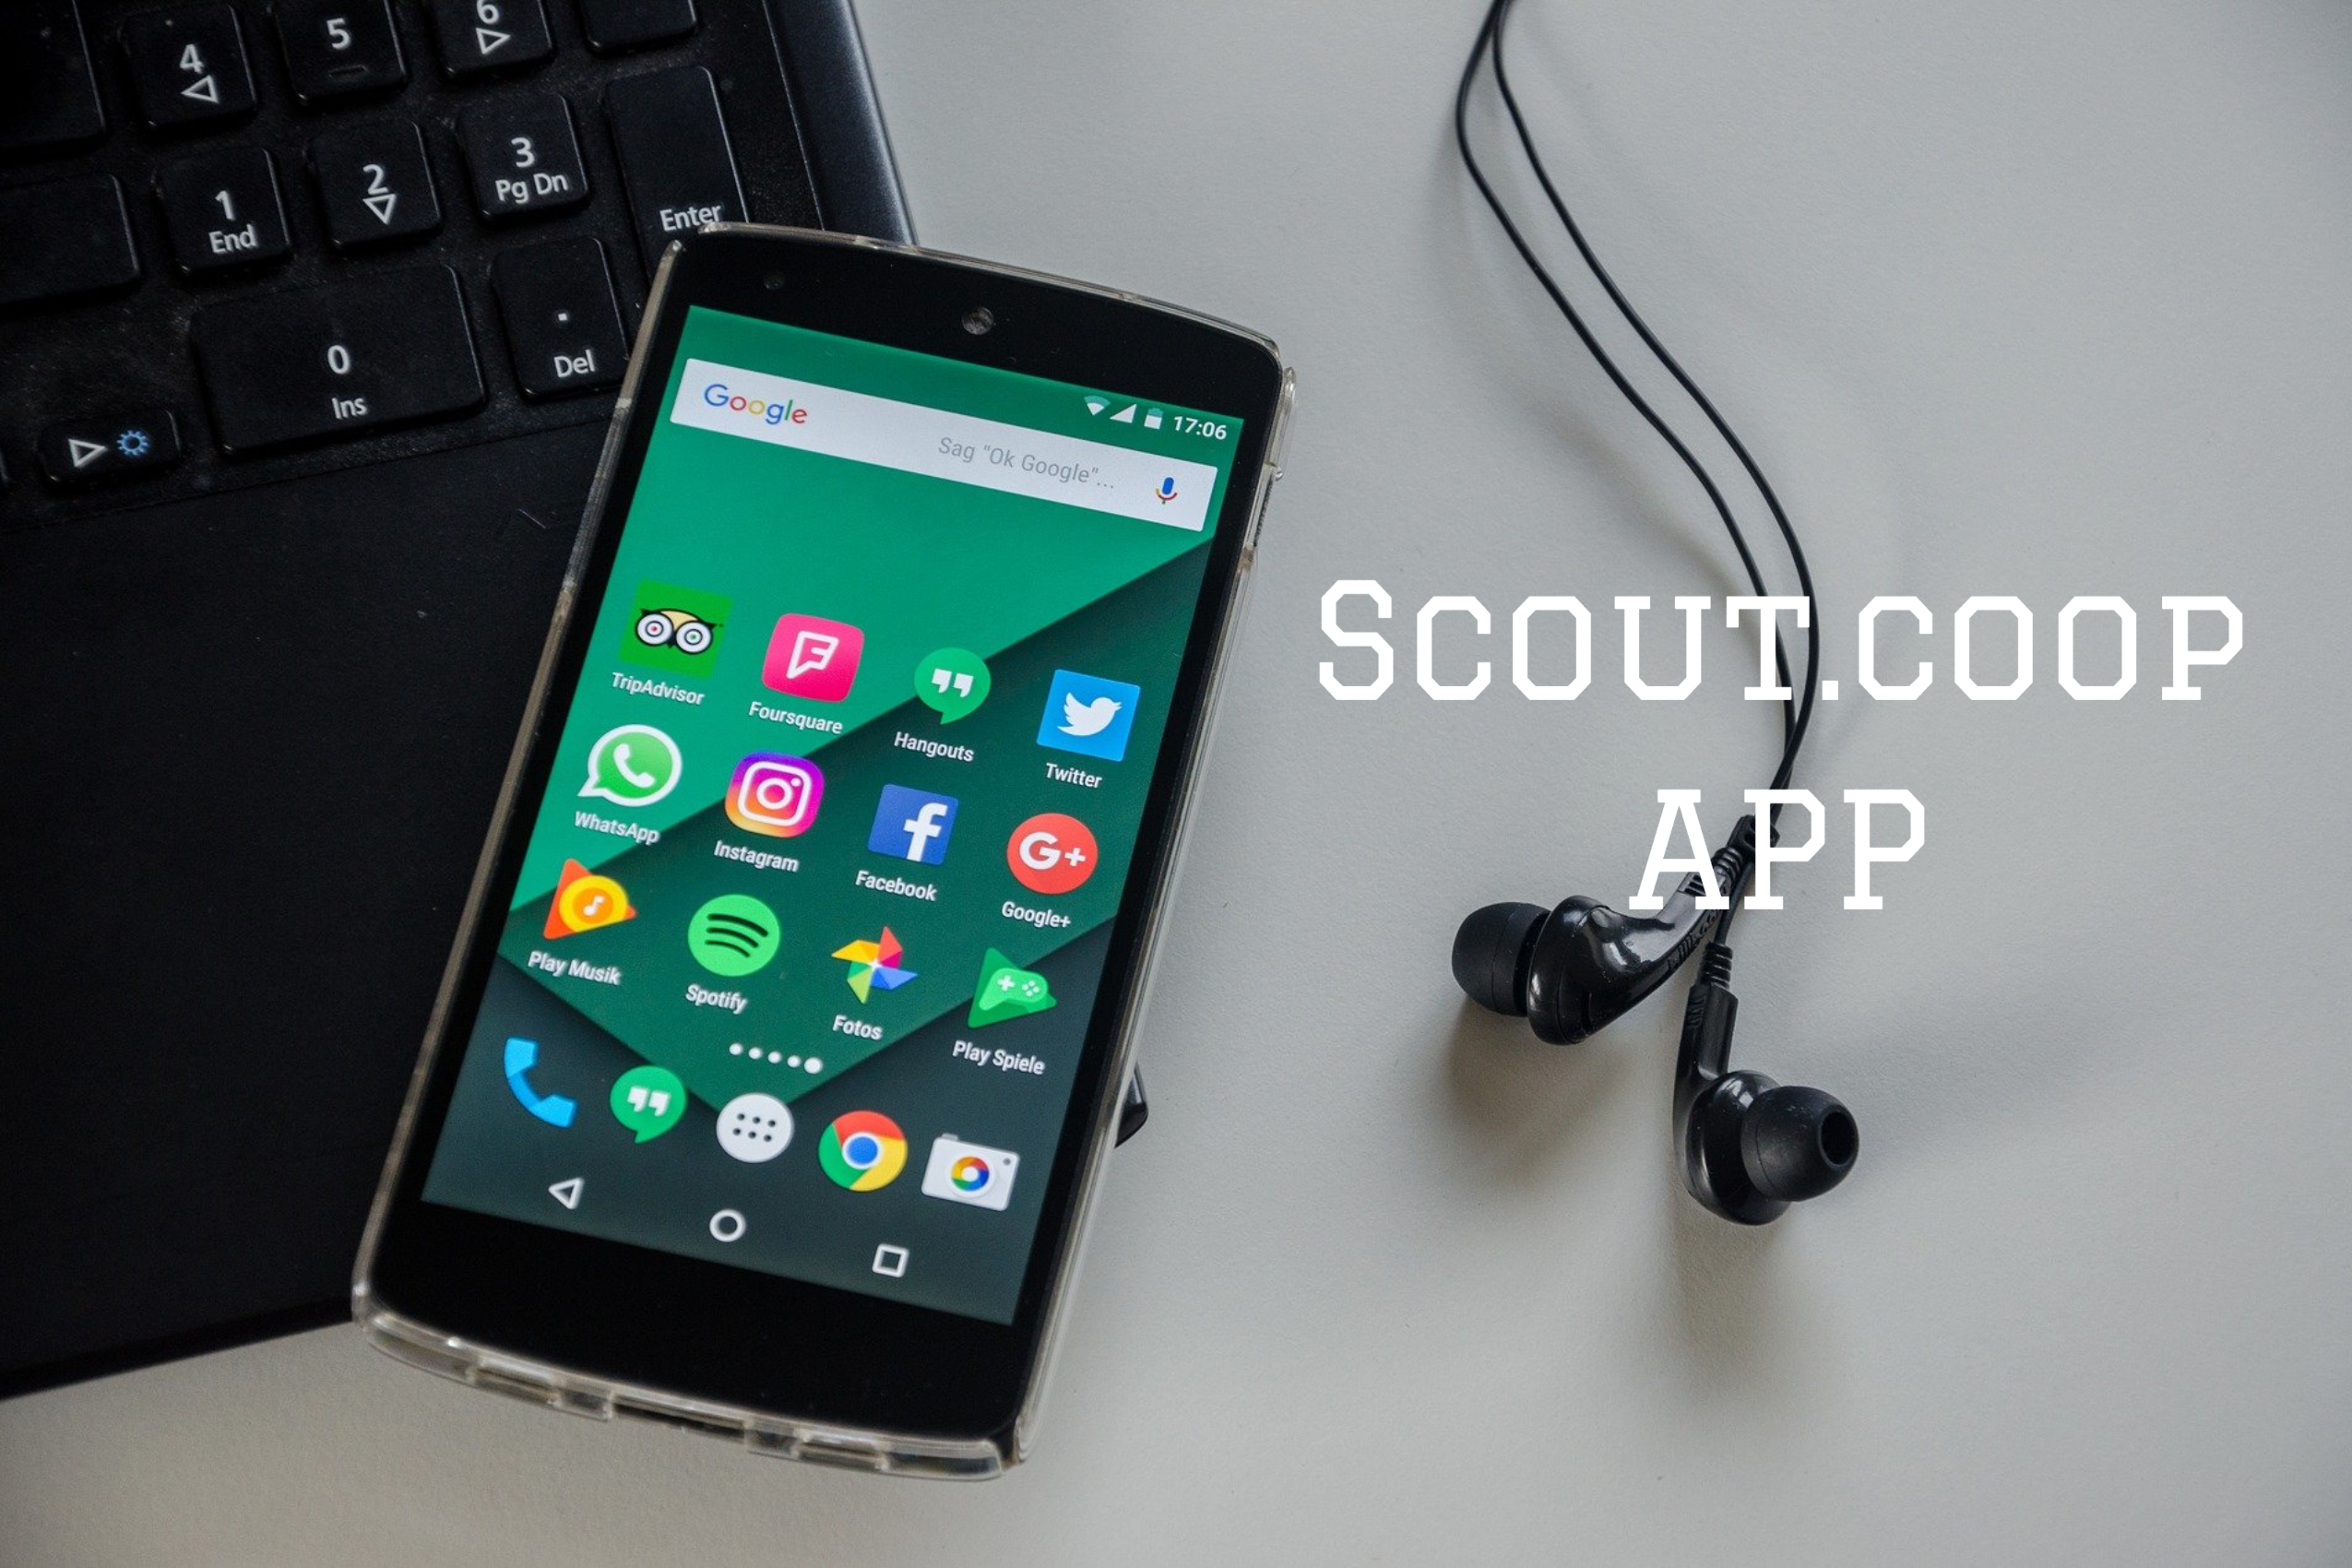 App Scout.coop